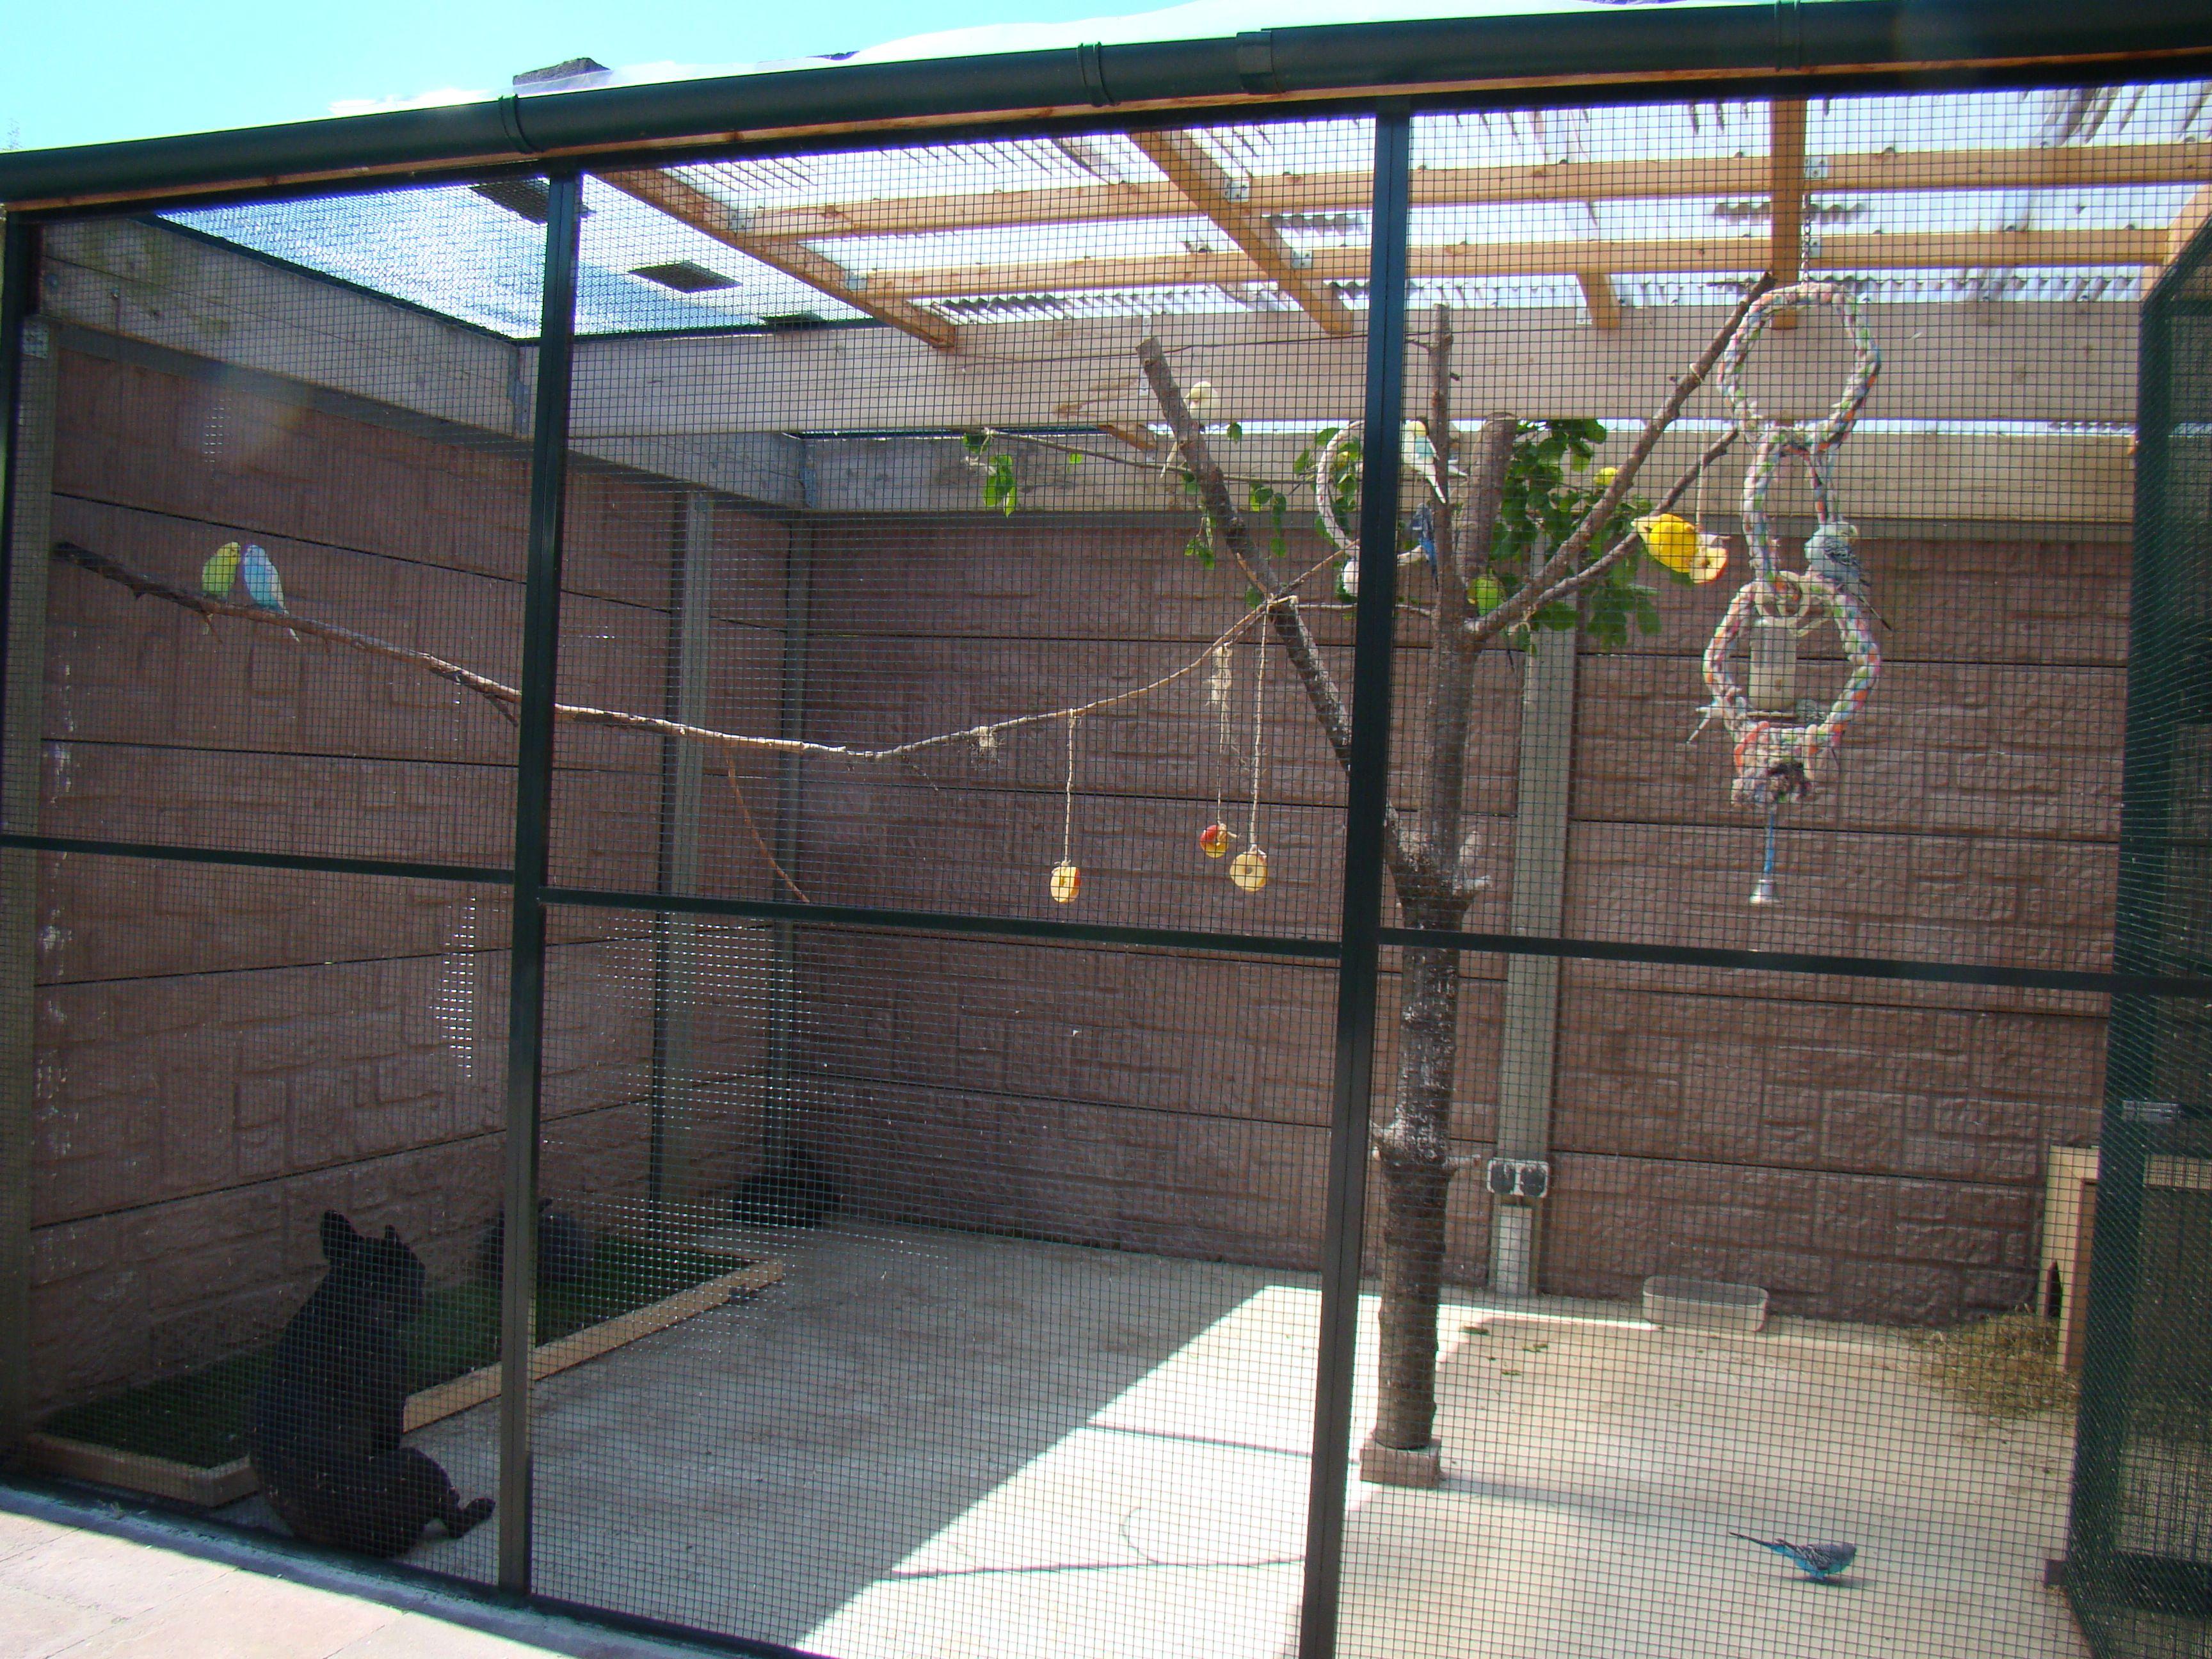 Aviary | Building Bird Aviaries | Pinterest | Bird aviary, Bird and ...